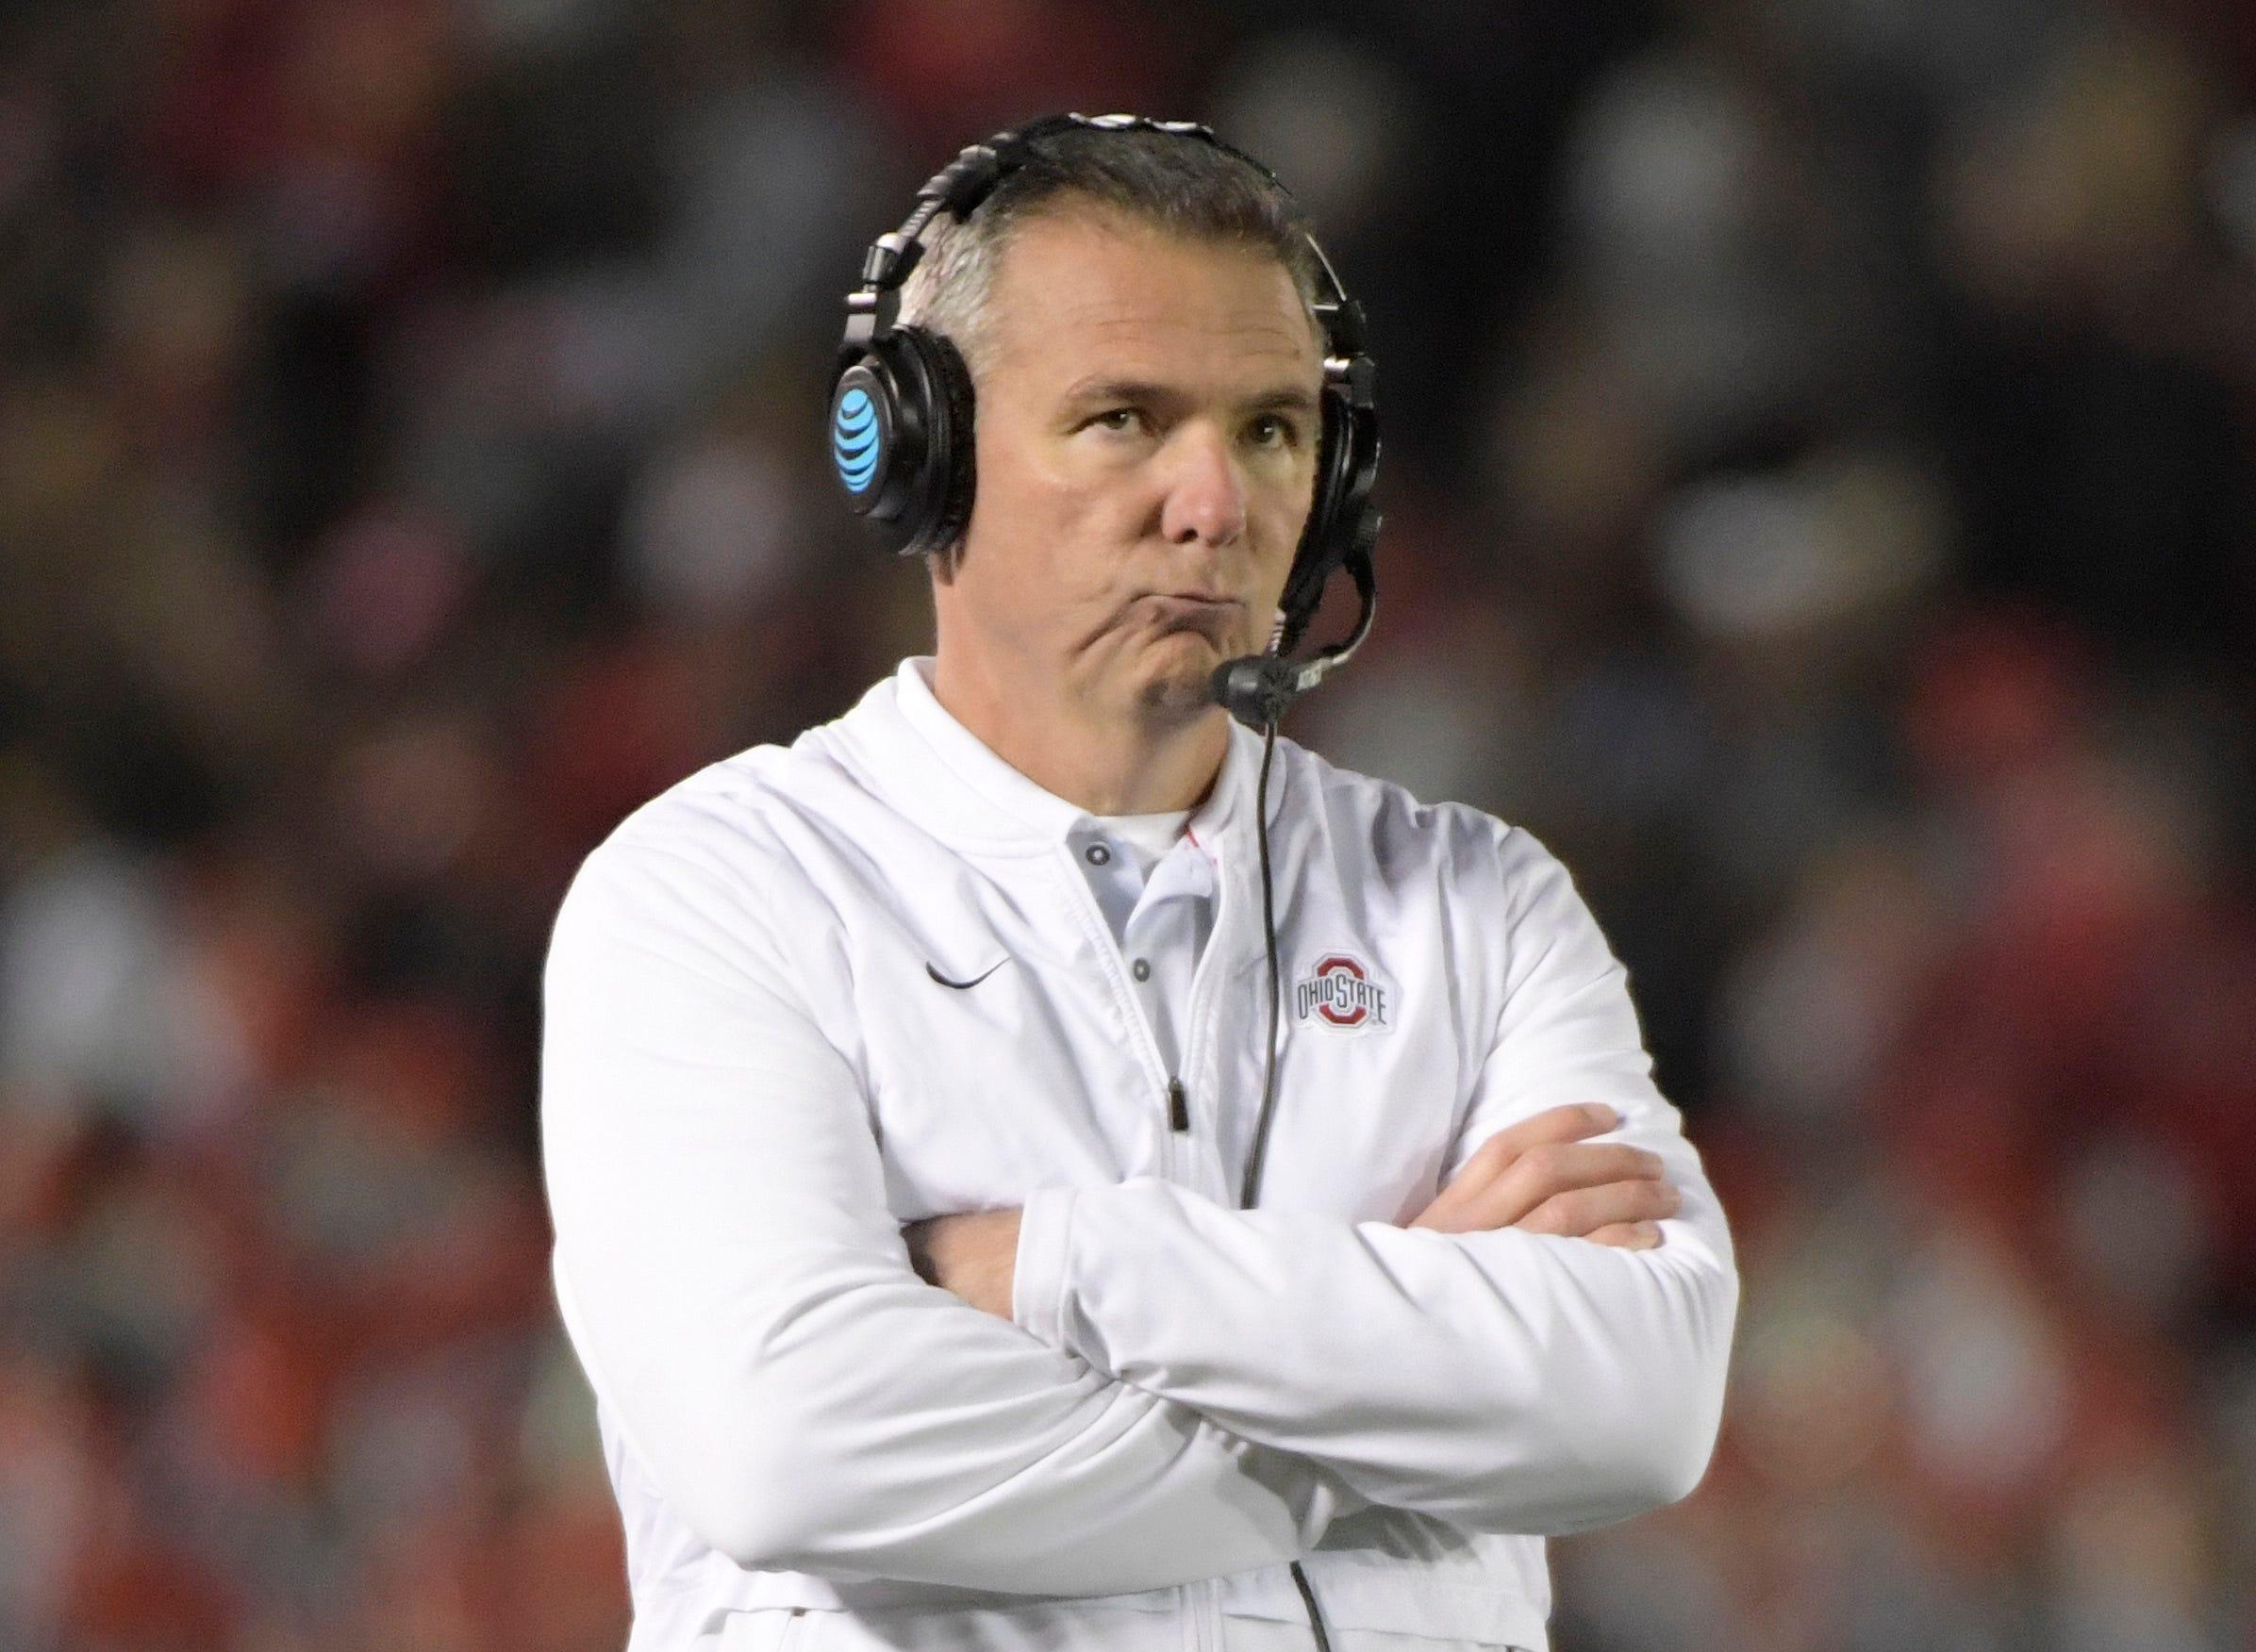 Former Ohio State football coach Urban Meyer reveals he had coronavirus